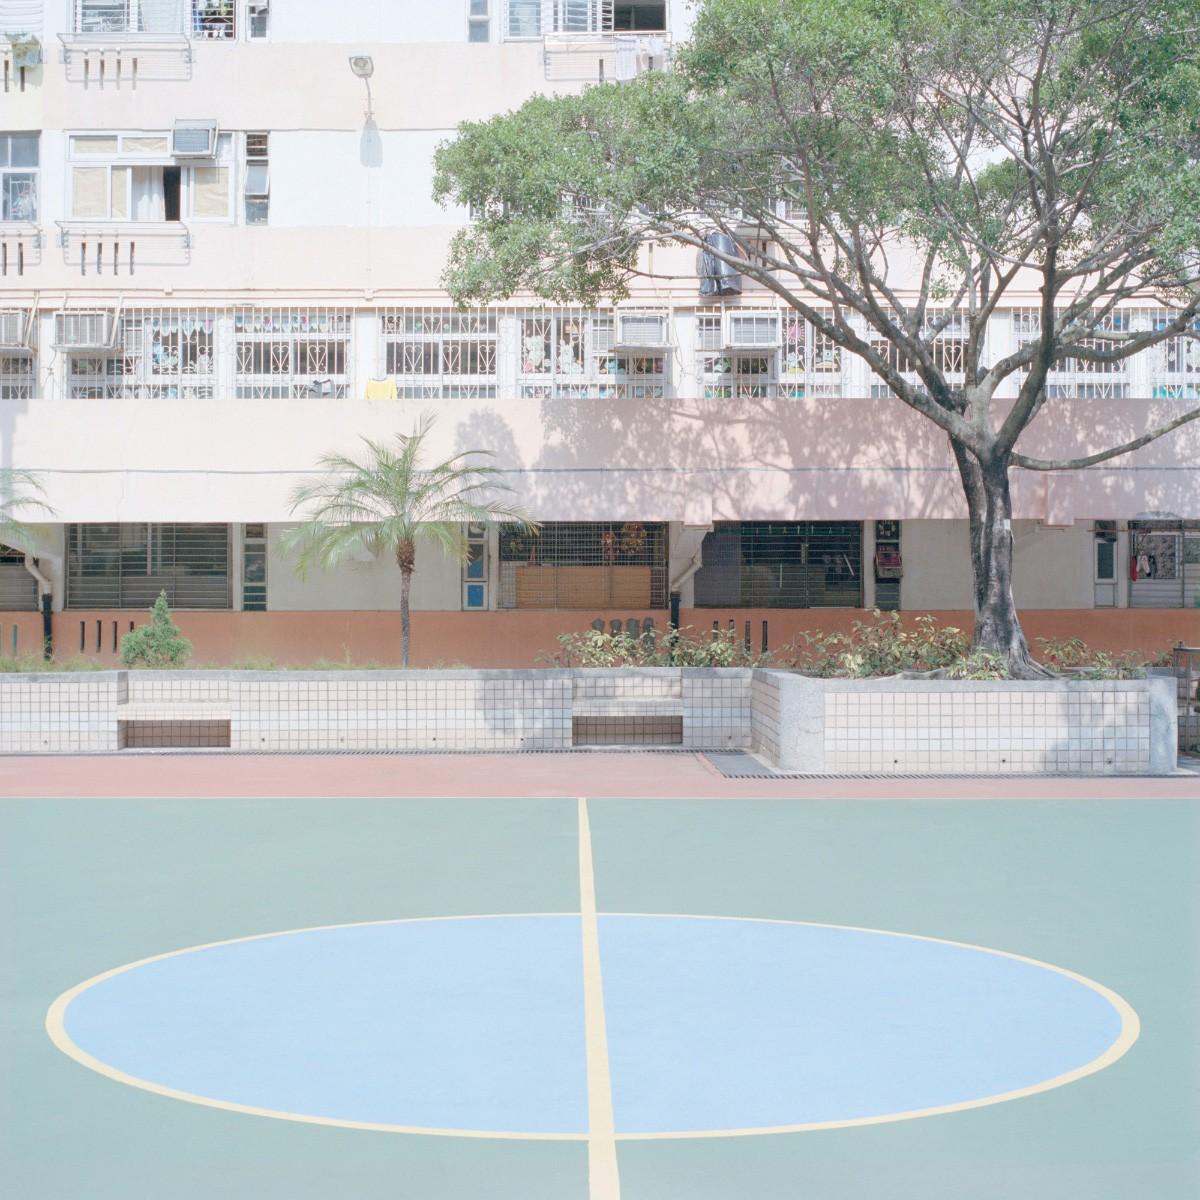 ward-roberts-courts-02.3-ed6f9eaa0d48a8c2ff86b70e05c890a6